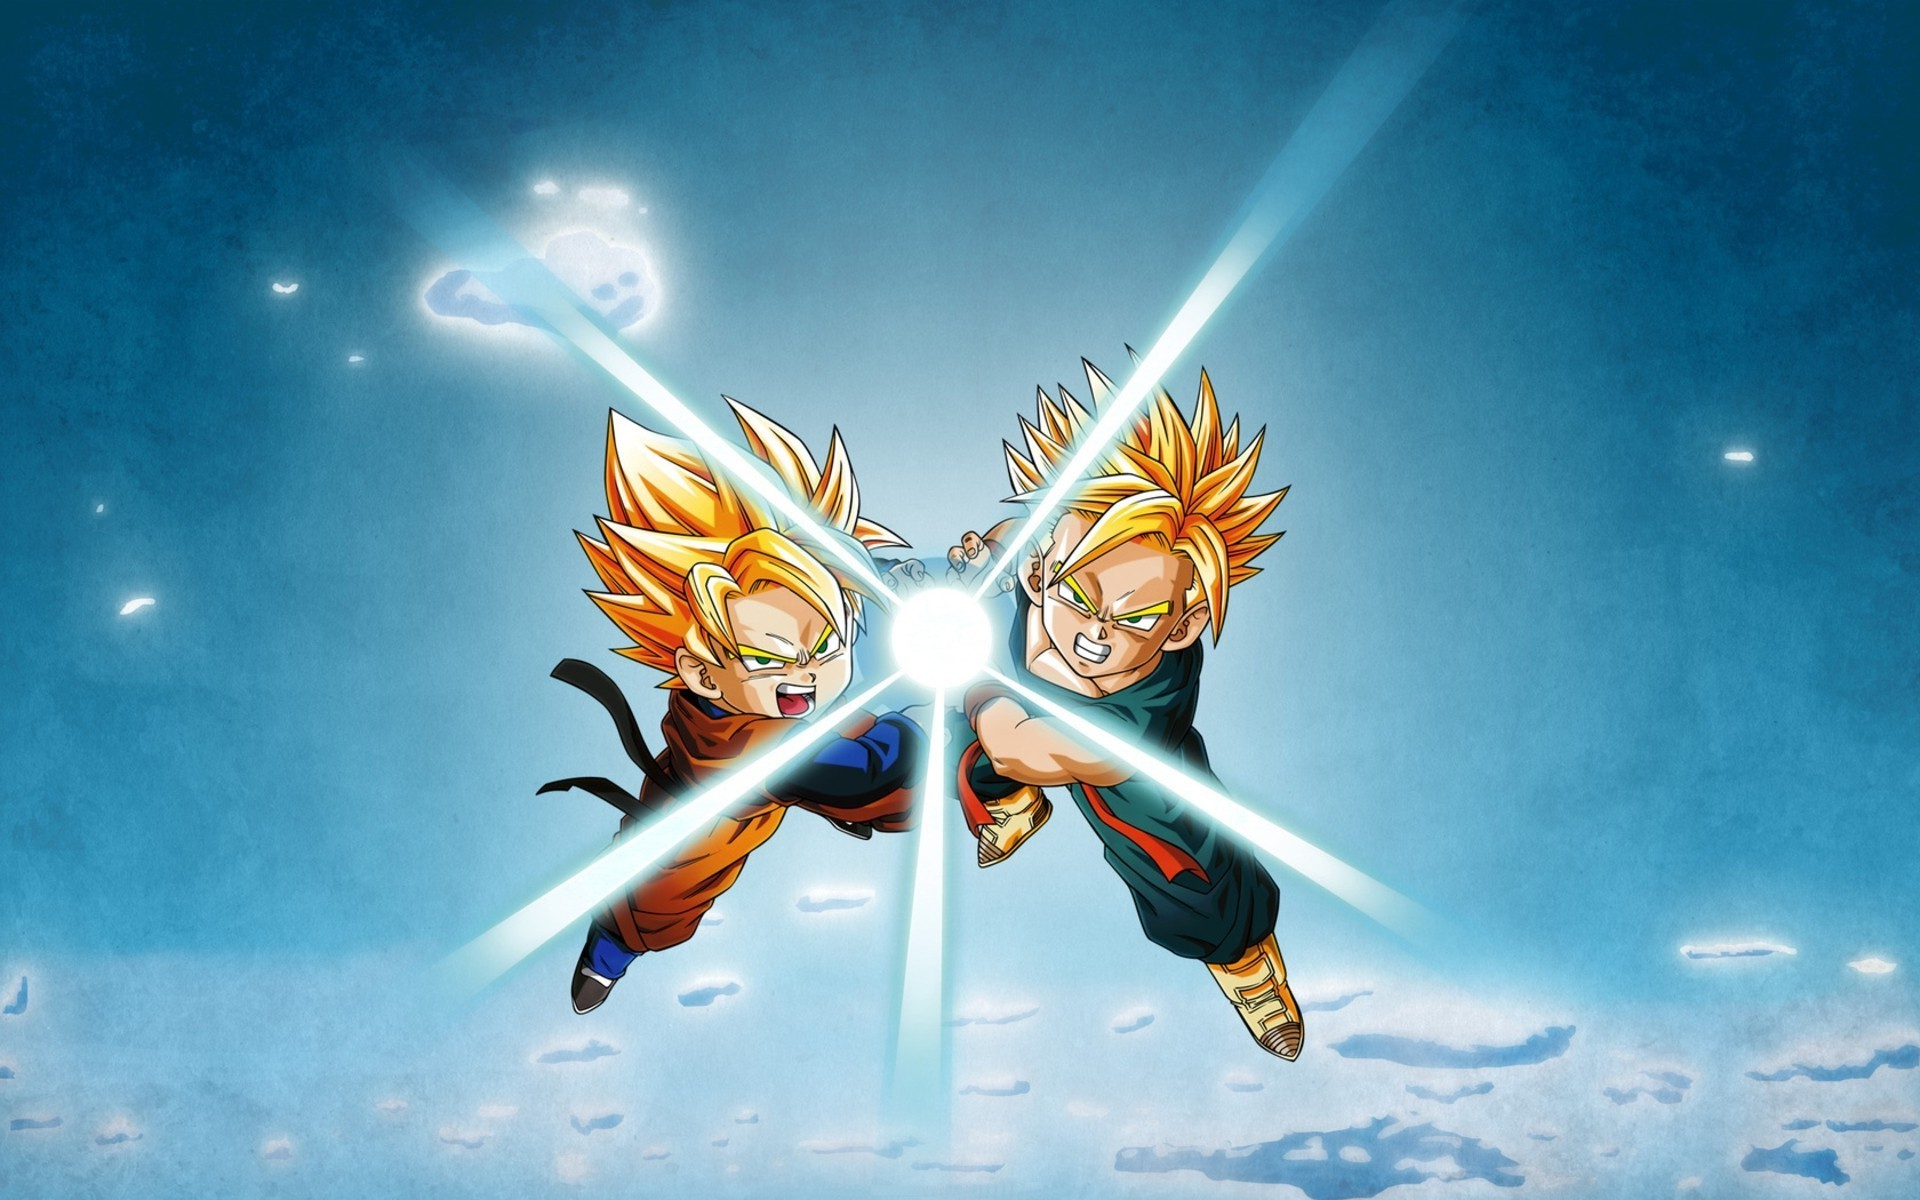 Dragon Ball, Super Saiyan, Trunks (character), Son Goten, Kamehameha  Wallpapers HD / Desktop and Mobile Backgrounds